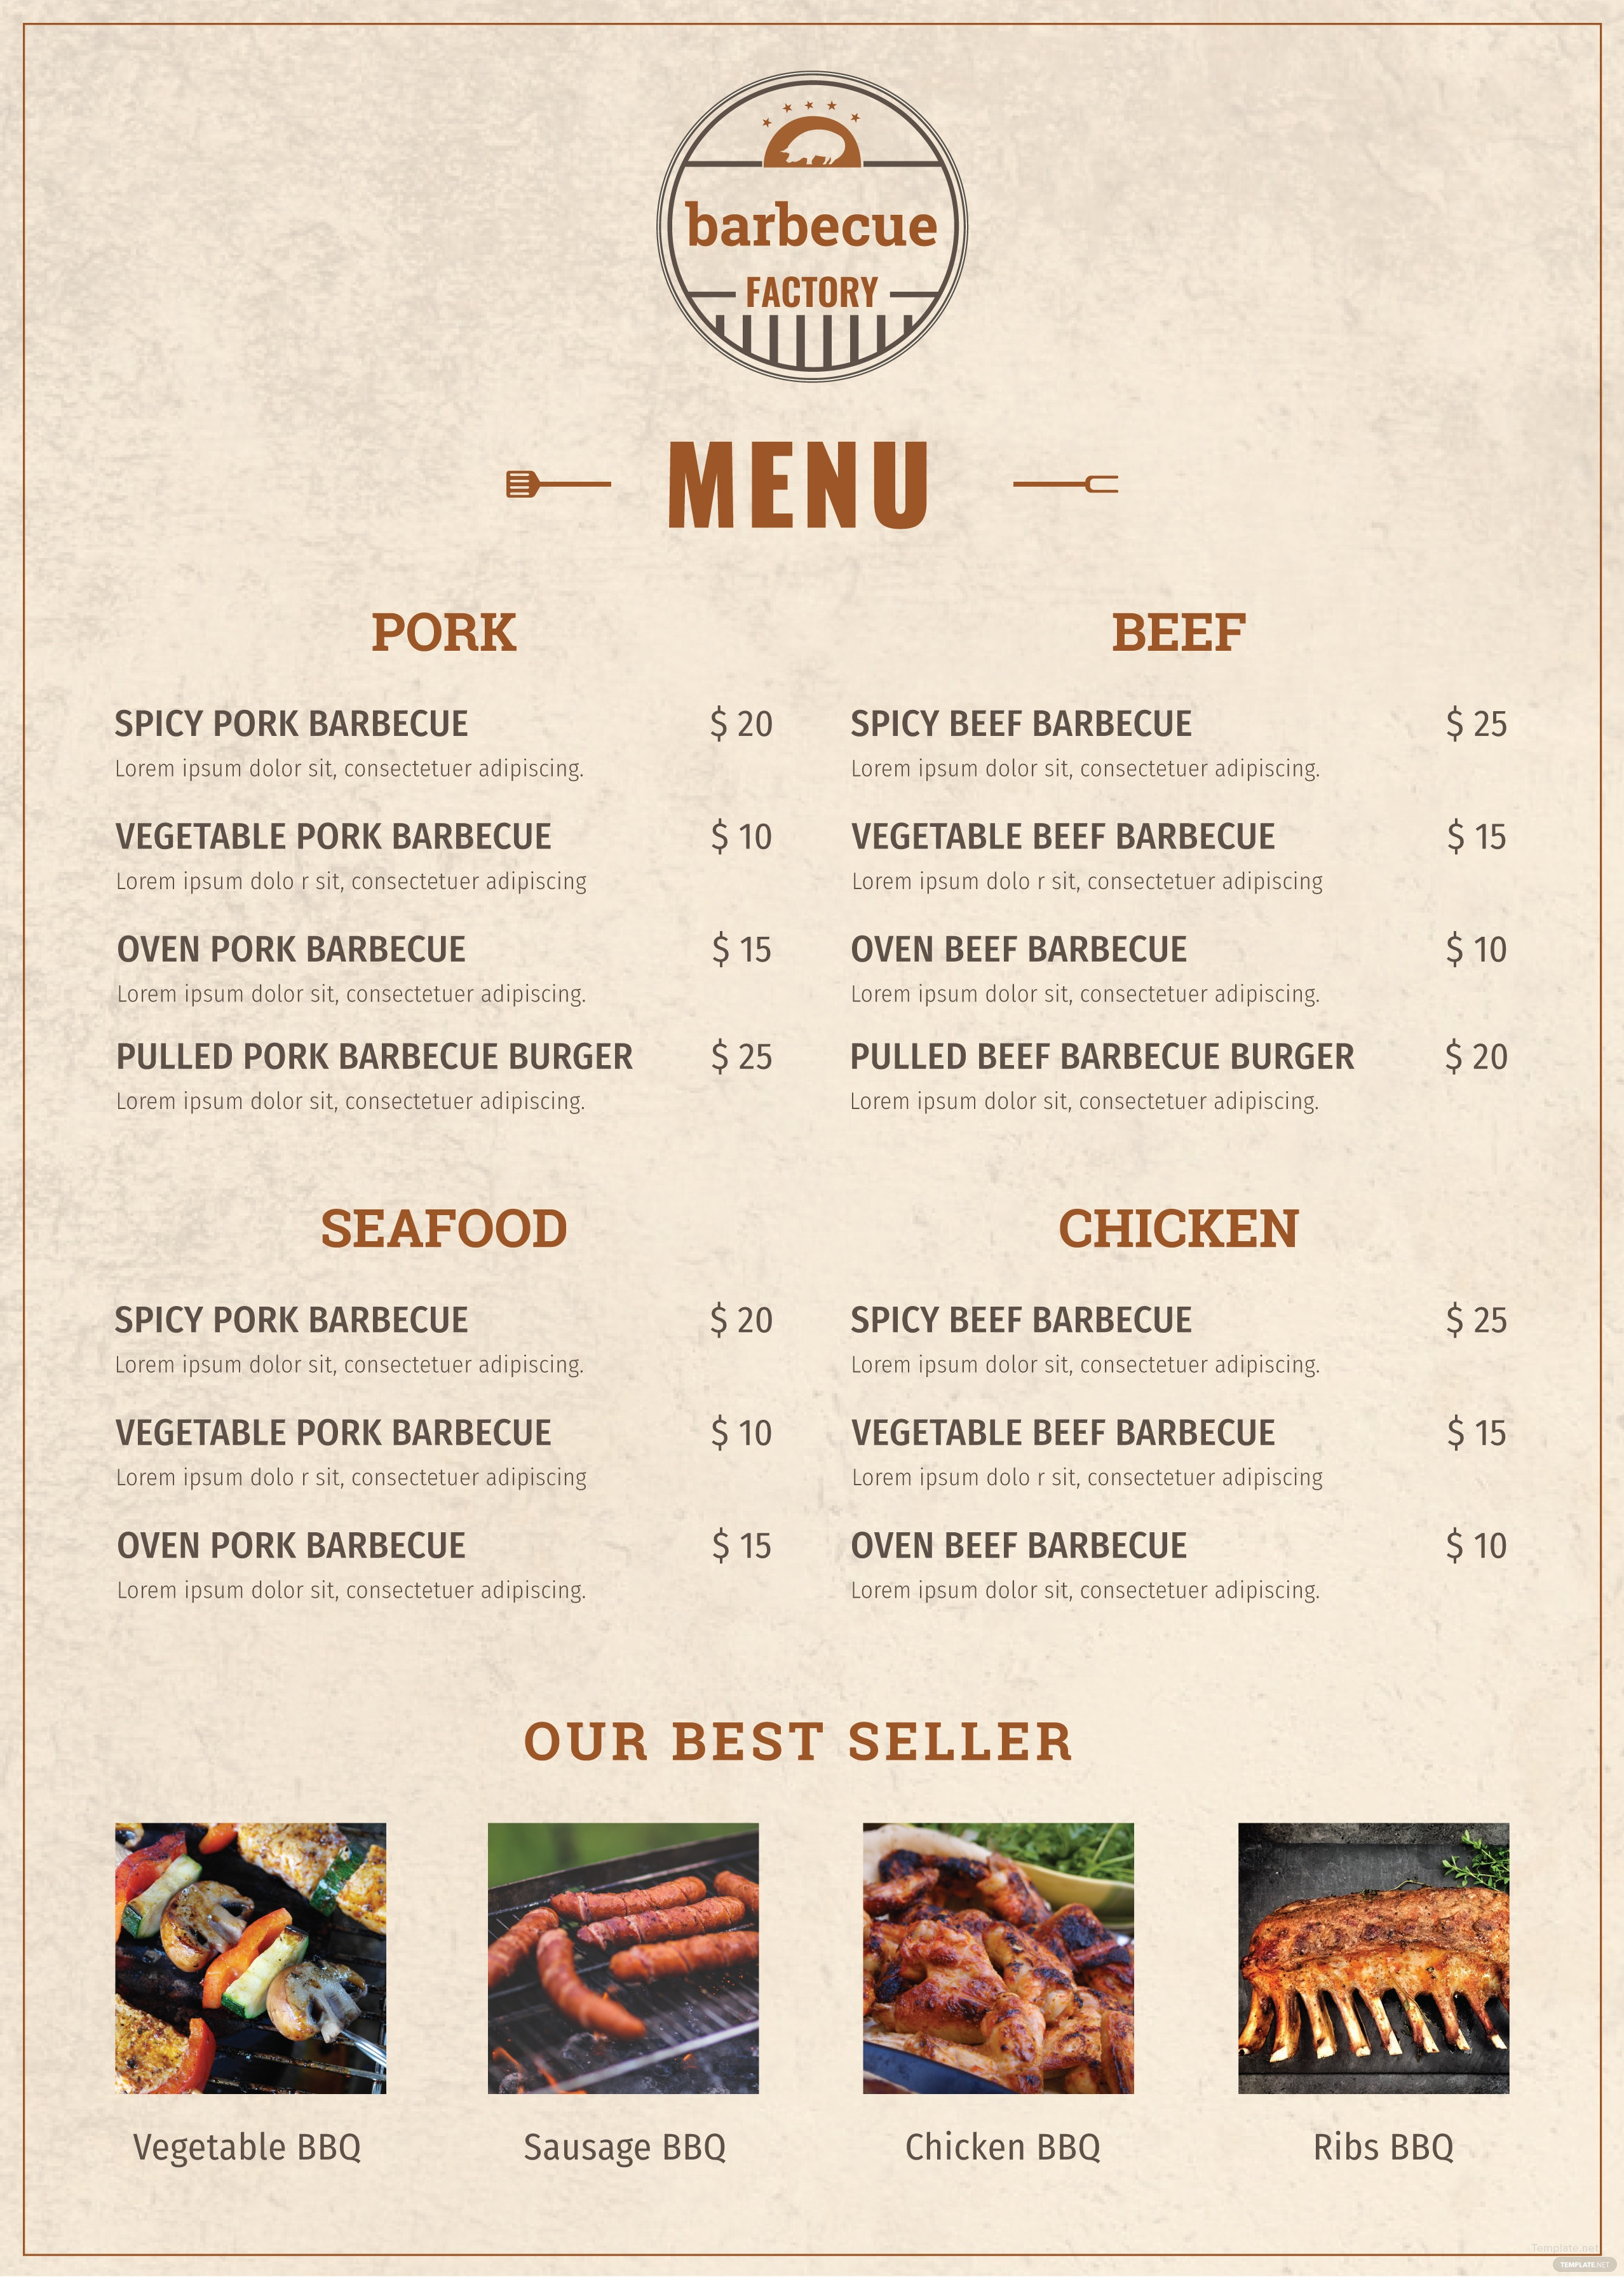 free minimal barbecue menu template in adobe photoshop